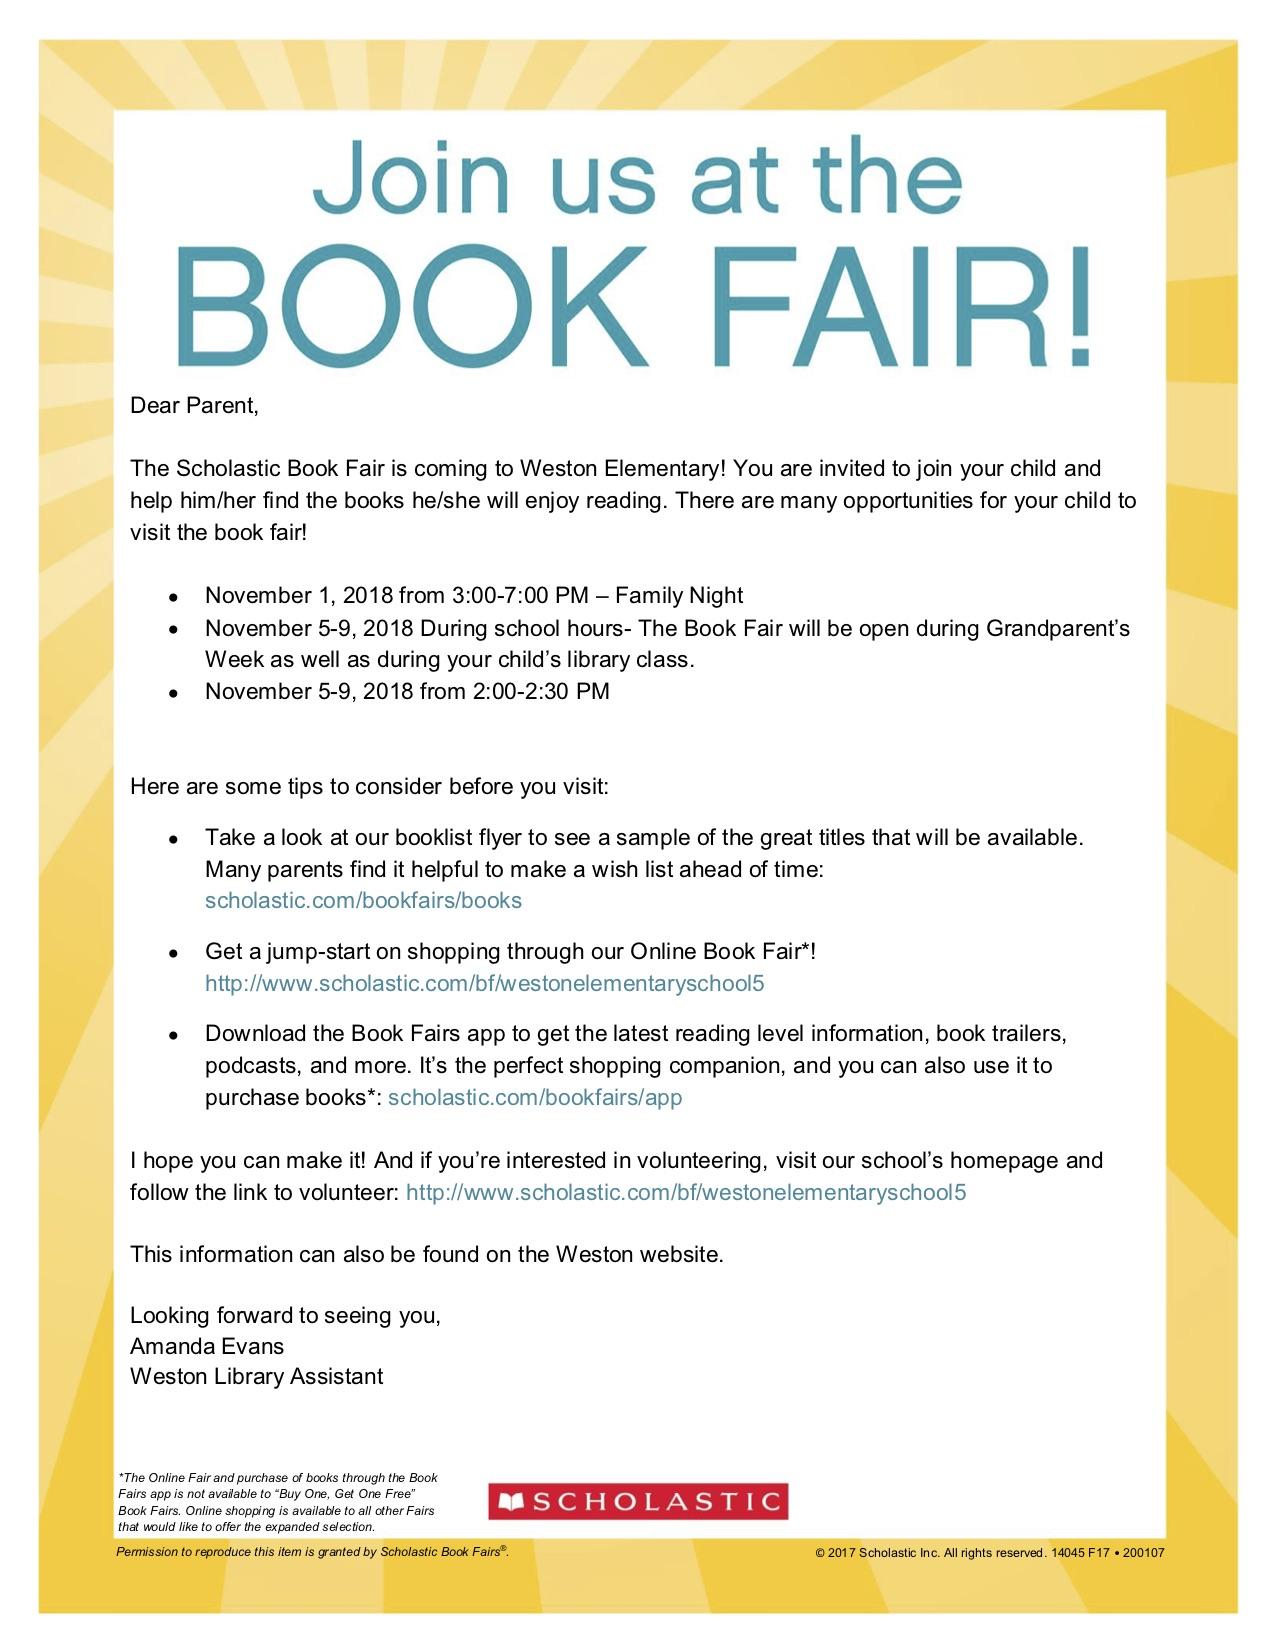 Book Fair – Weston Elementary School